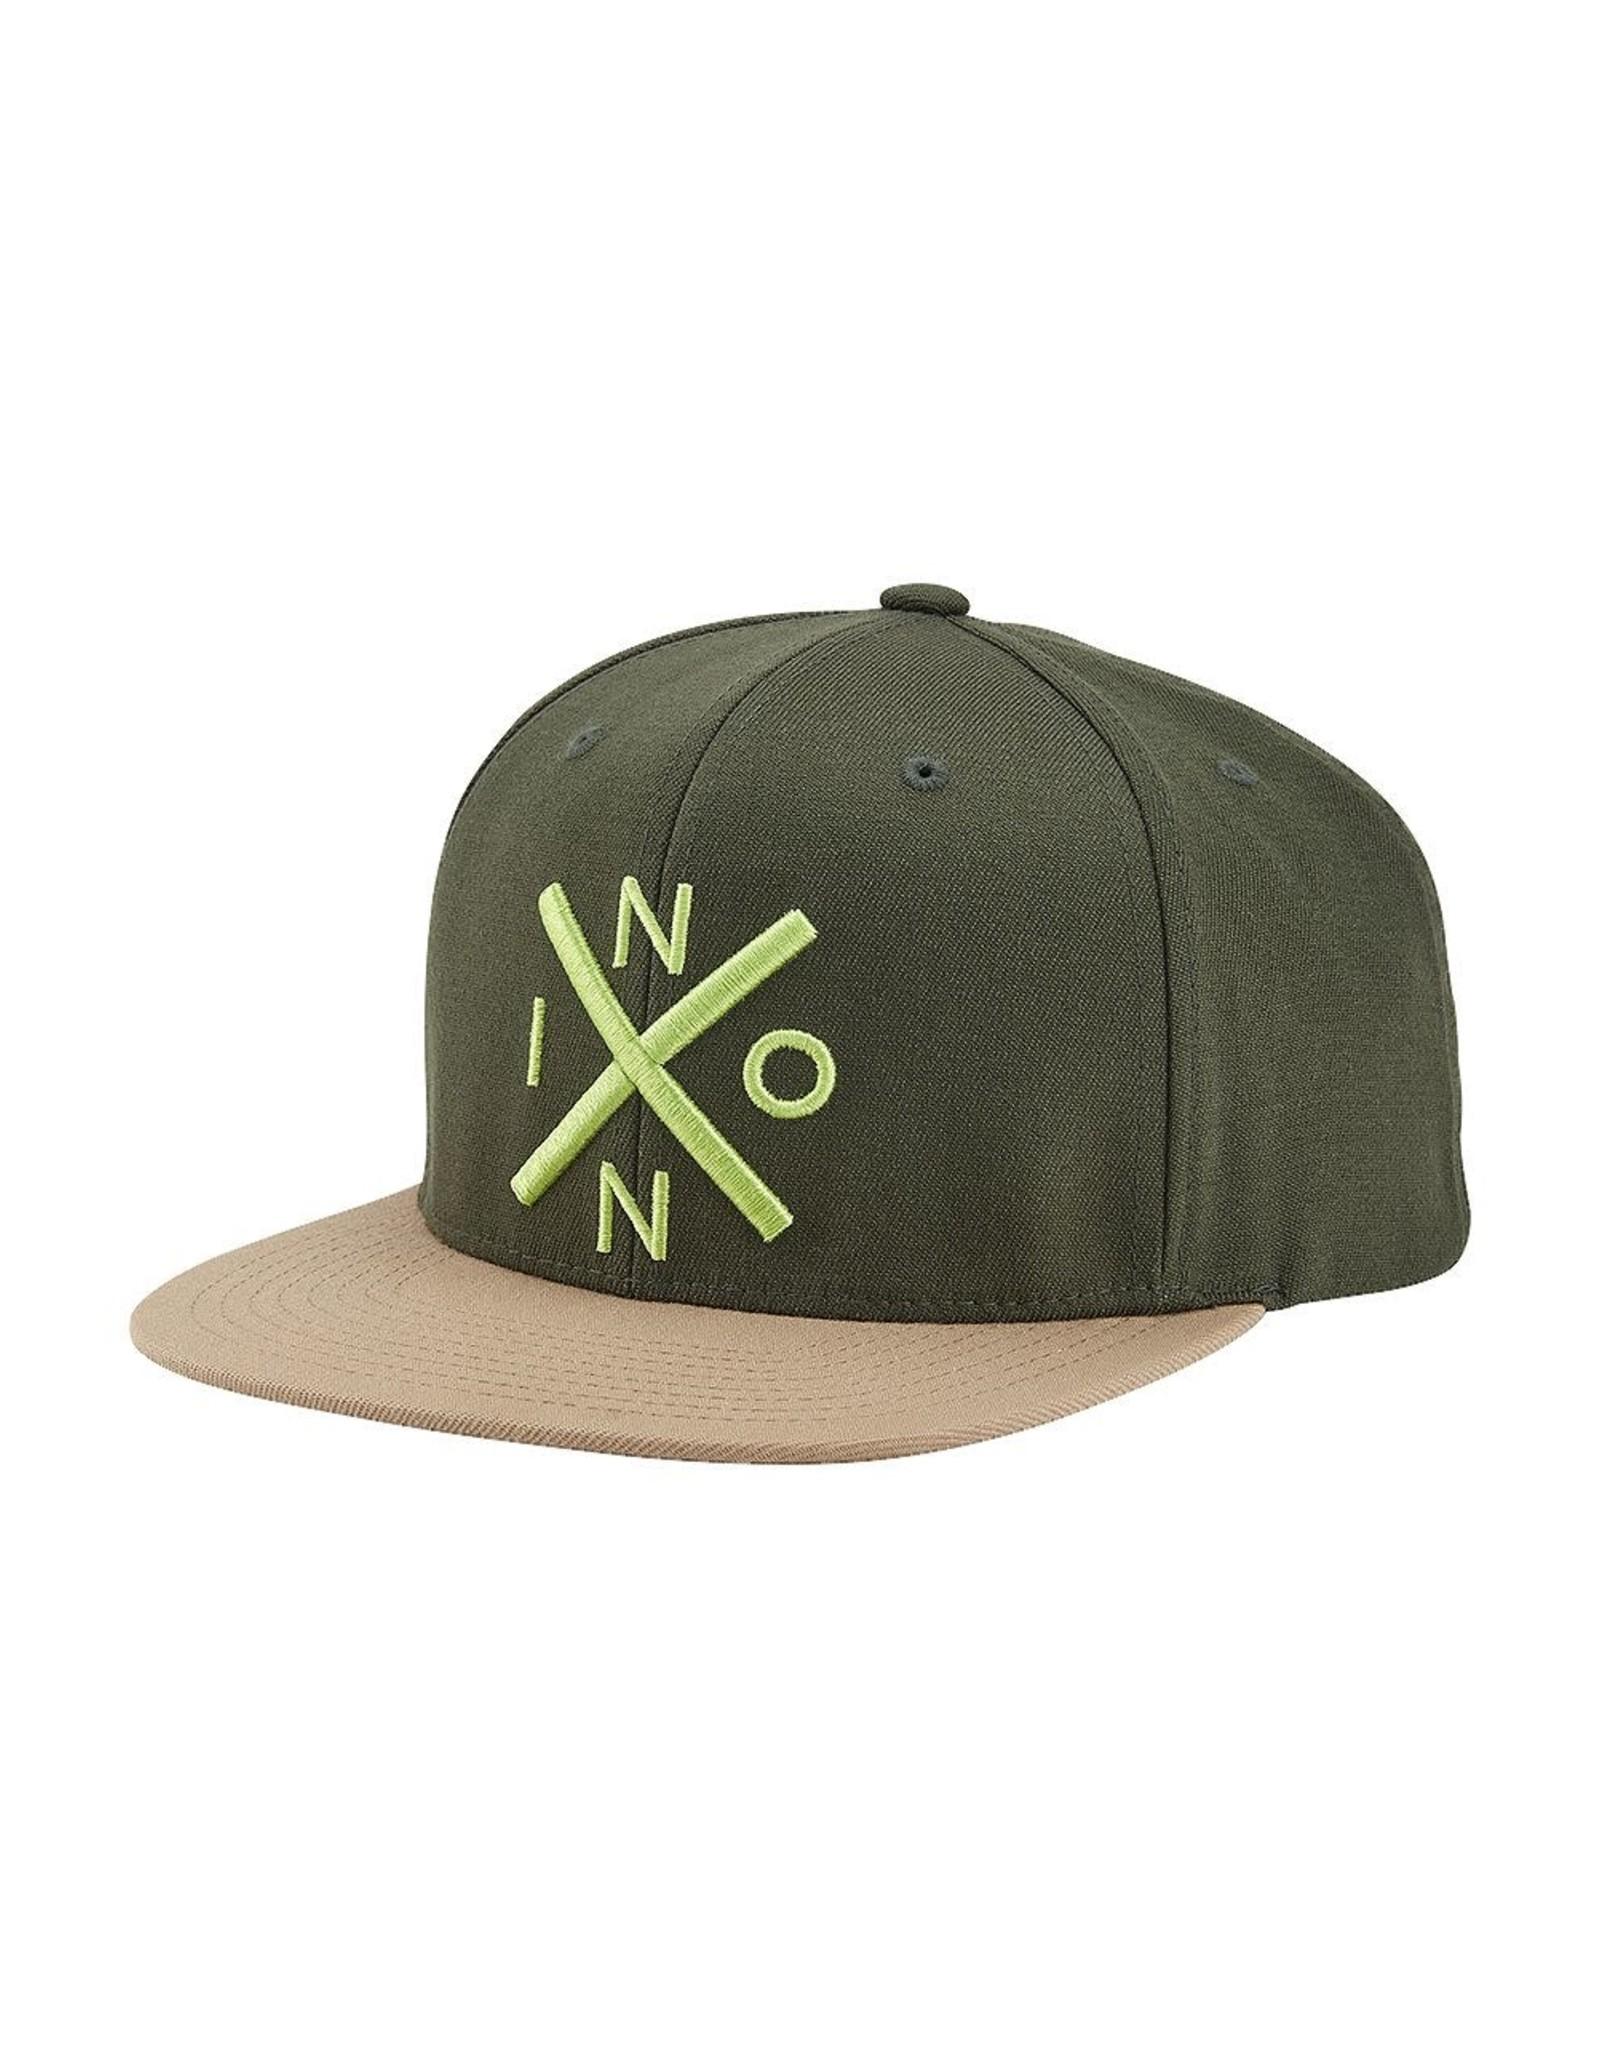 nixon Nixon - Casquette homme exchange snapback olive/khaki